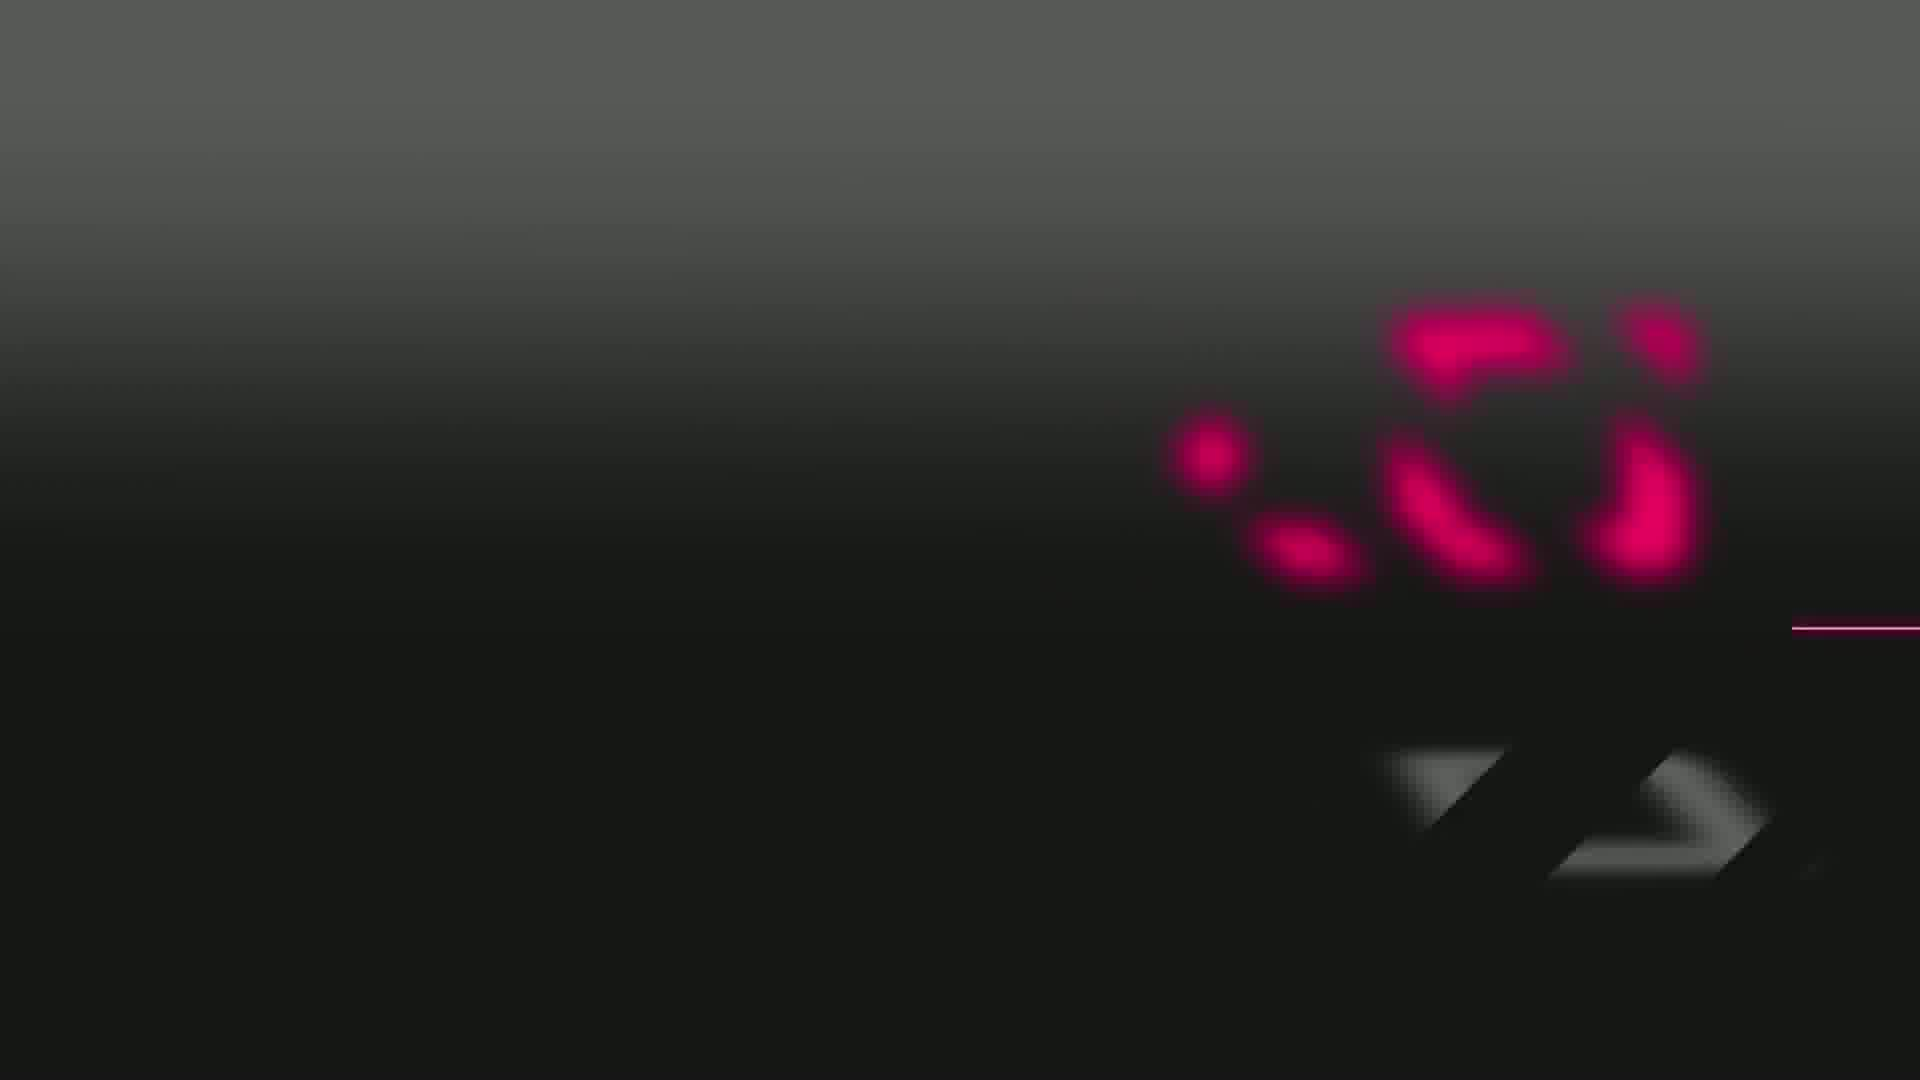 HAMEZO~ハメ撮りコレクション~vol.32 - 里中みき【正常位 騎乗位 座位 中出し】